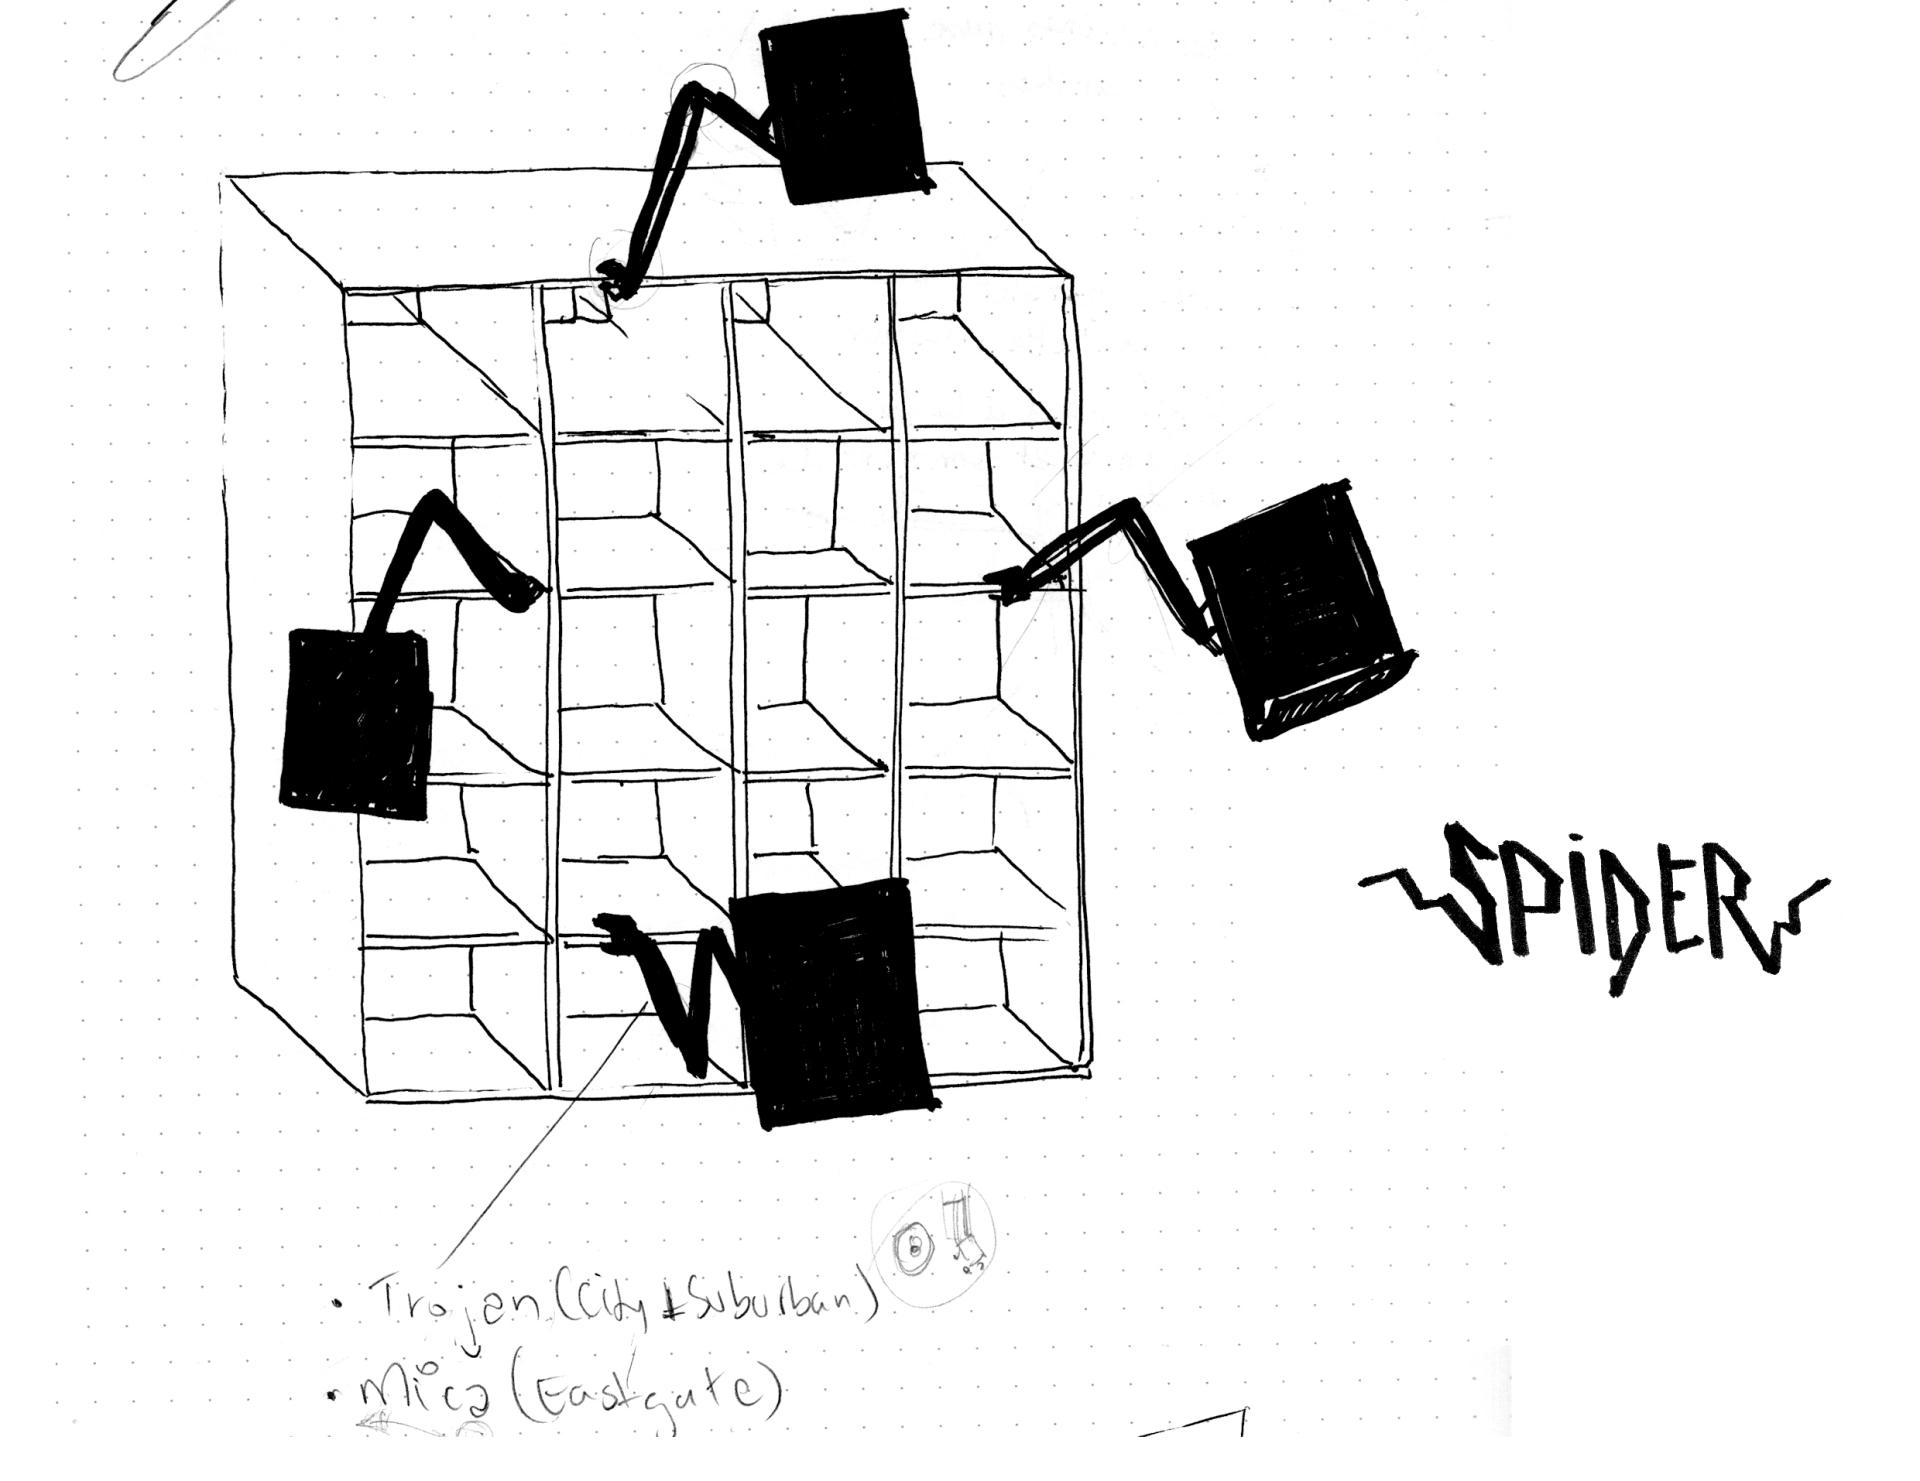 SpiderMH